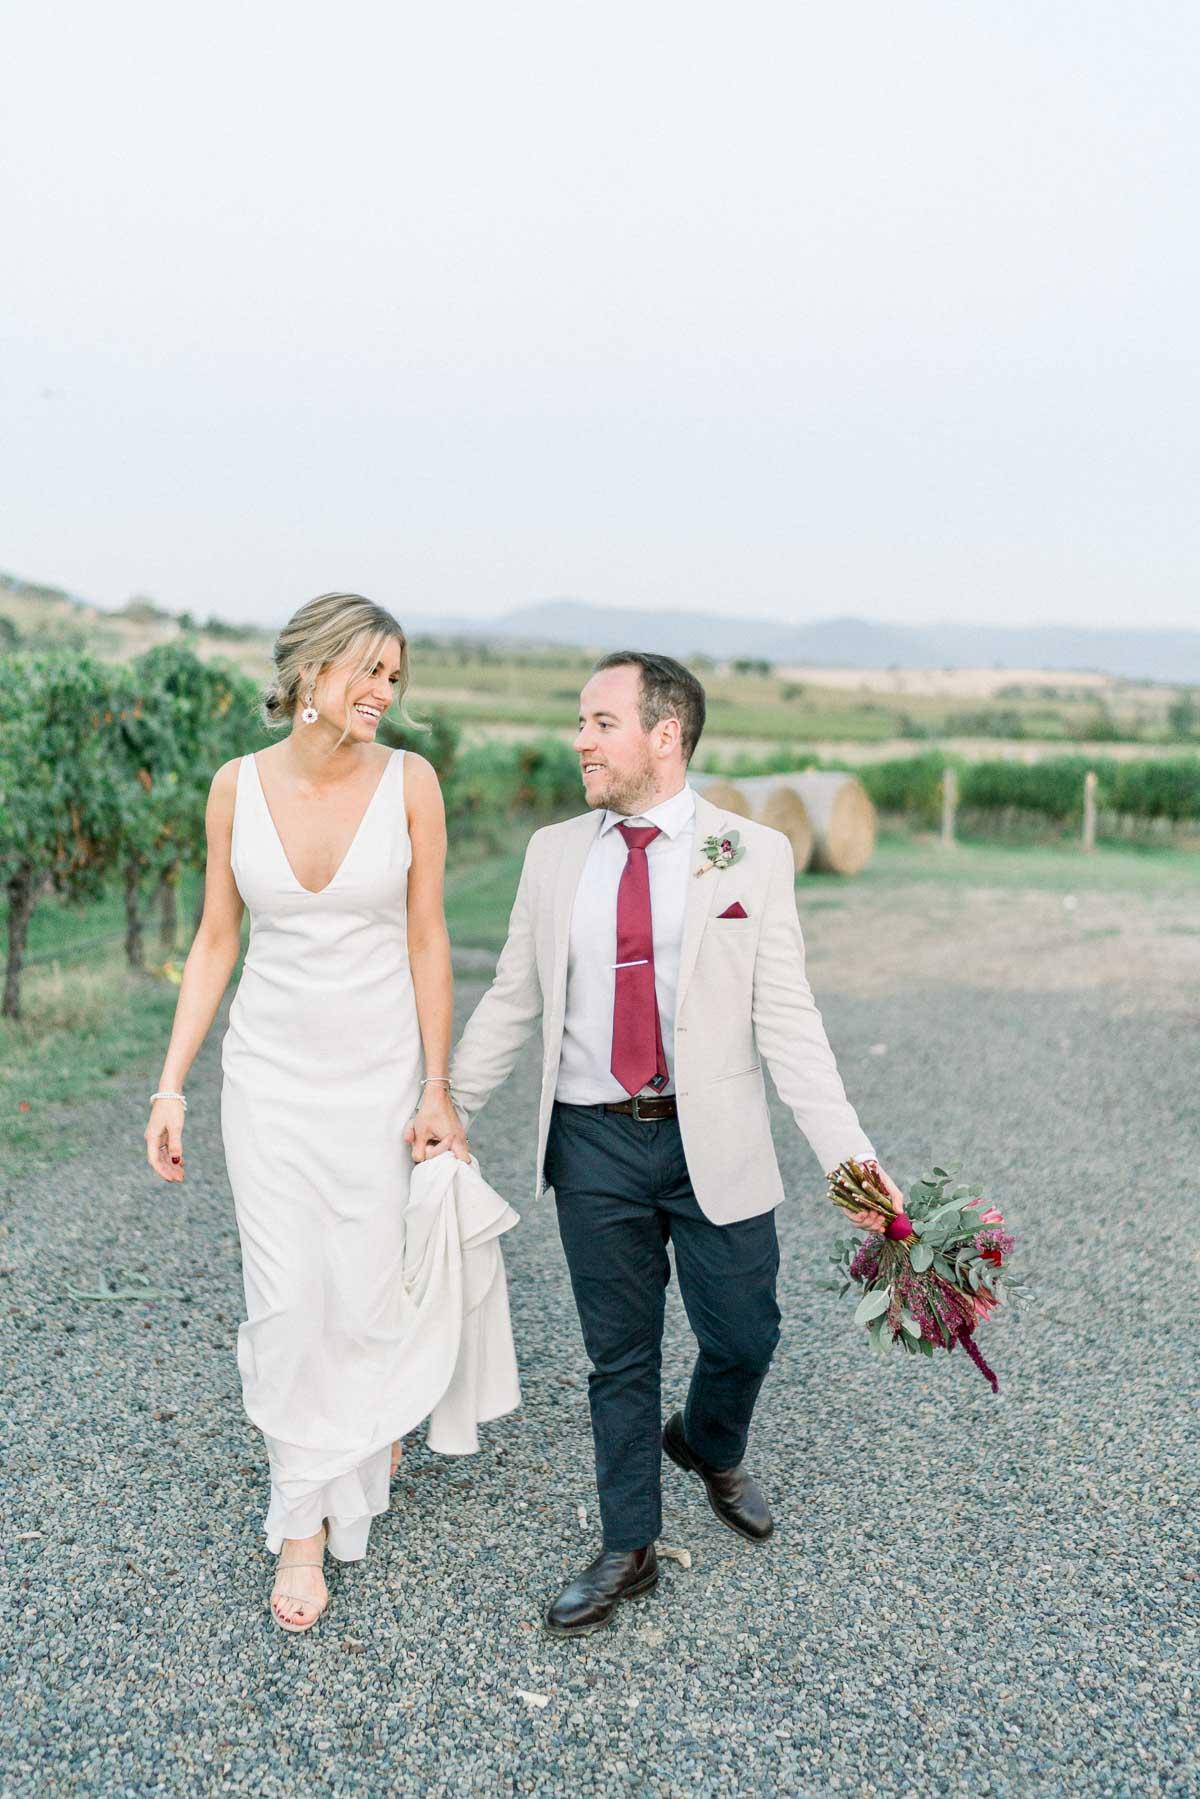 rustic-yarra-valley-wedding-venue-acacia-ridge-georgia-james-08500.jpg